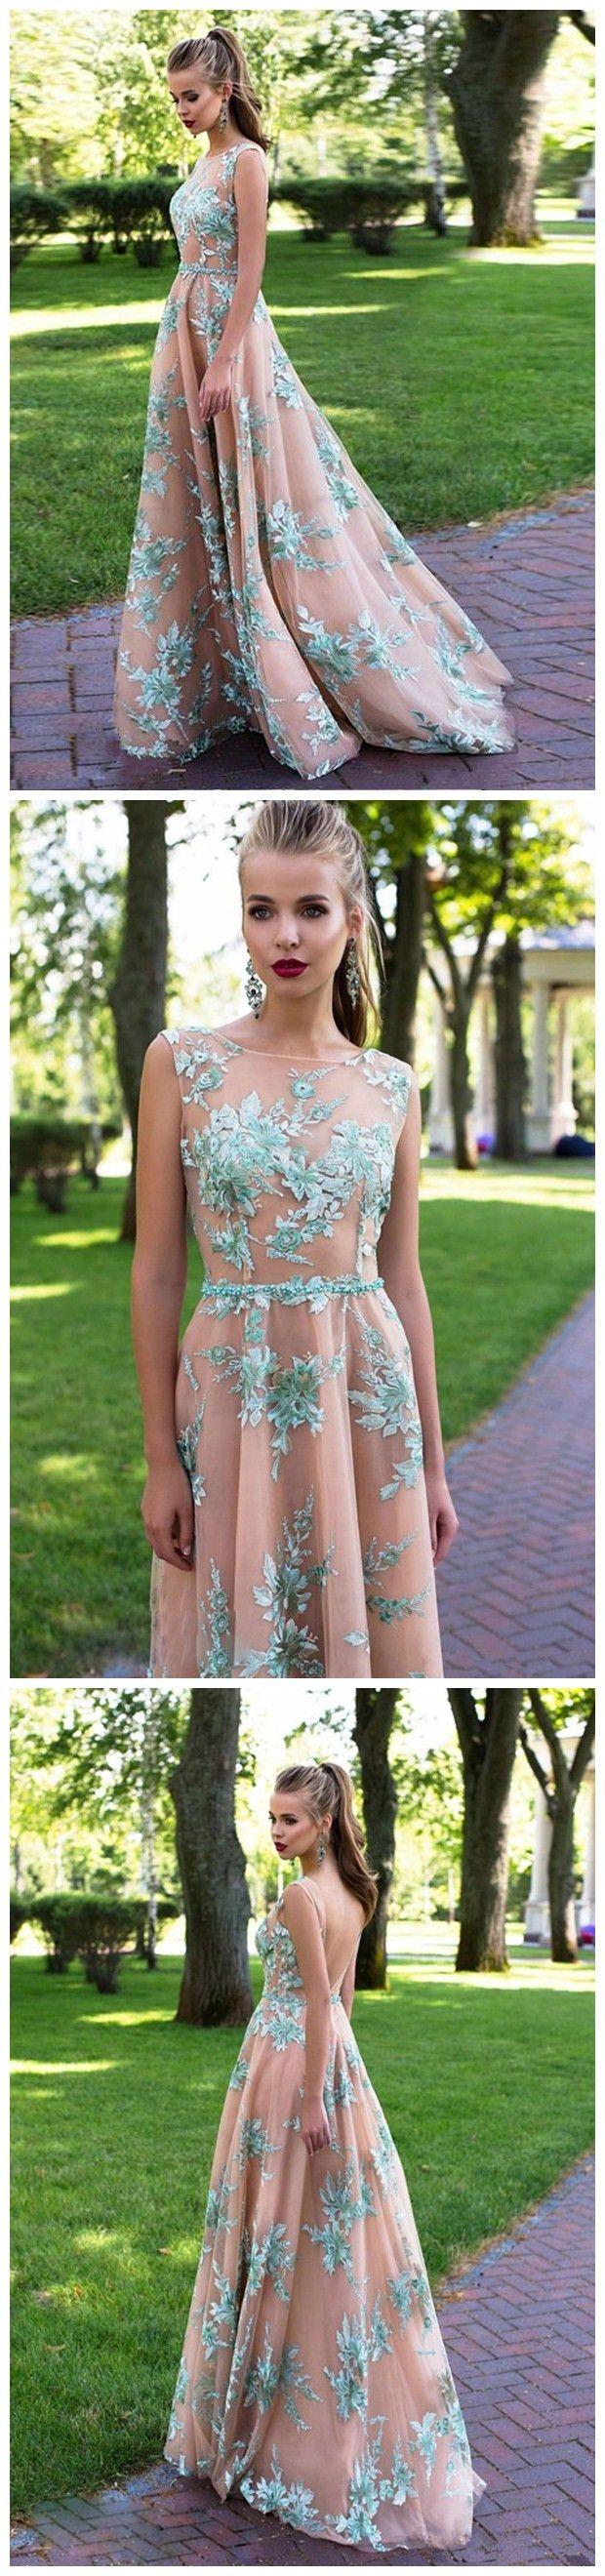 2018 Prom Dress prom dresses long,prom dresses modest,prom dresses boho,prom dresses champagne,prom dresses cheap,prom dresses scoop,beautiful prom dresses,prom dresses 2018,prom dresses elegant,prom dresses a line #amyprom #longpromdress #fashion #love #prom #formal